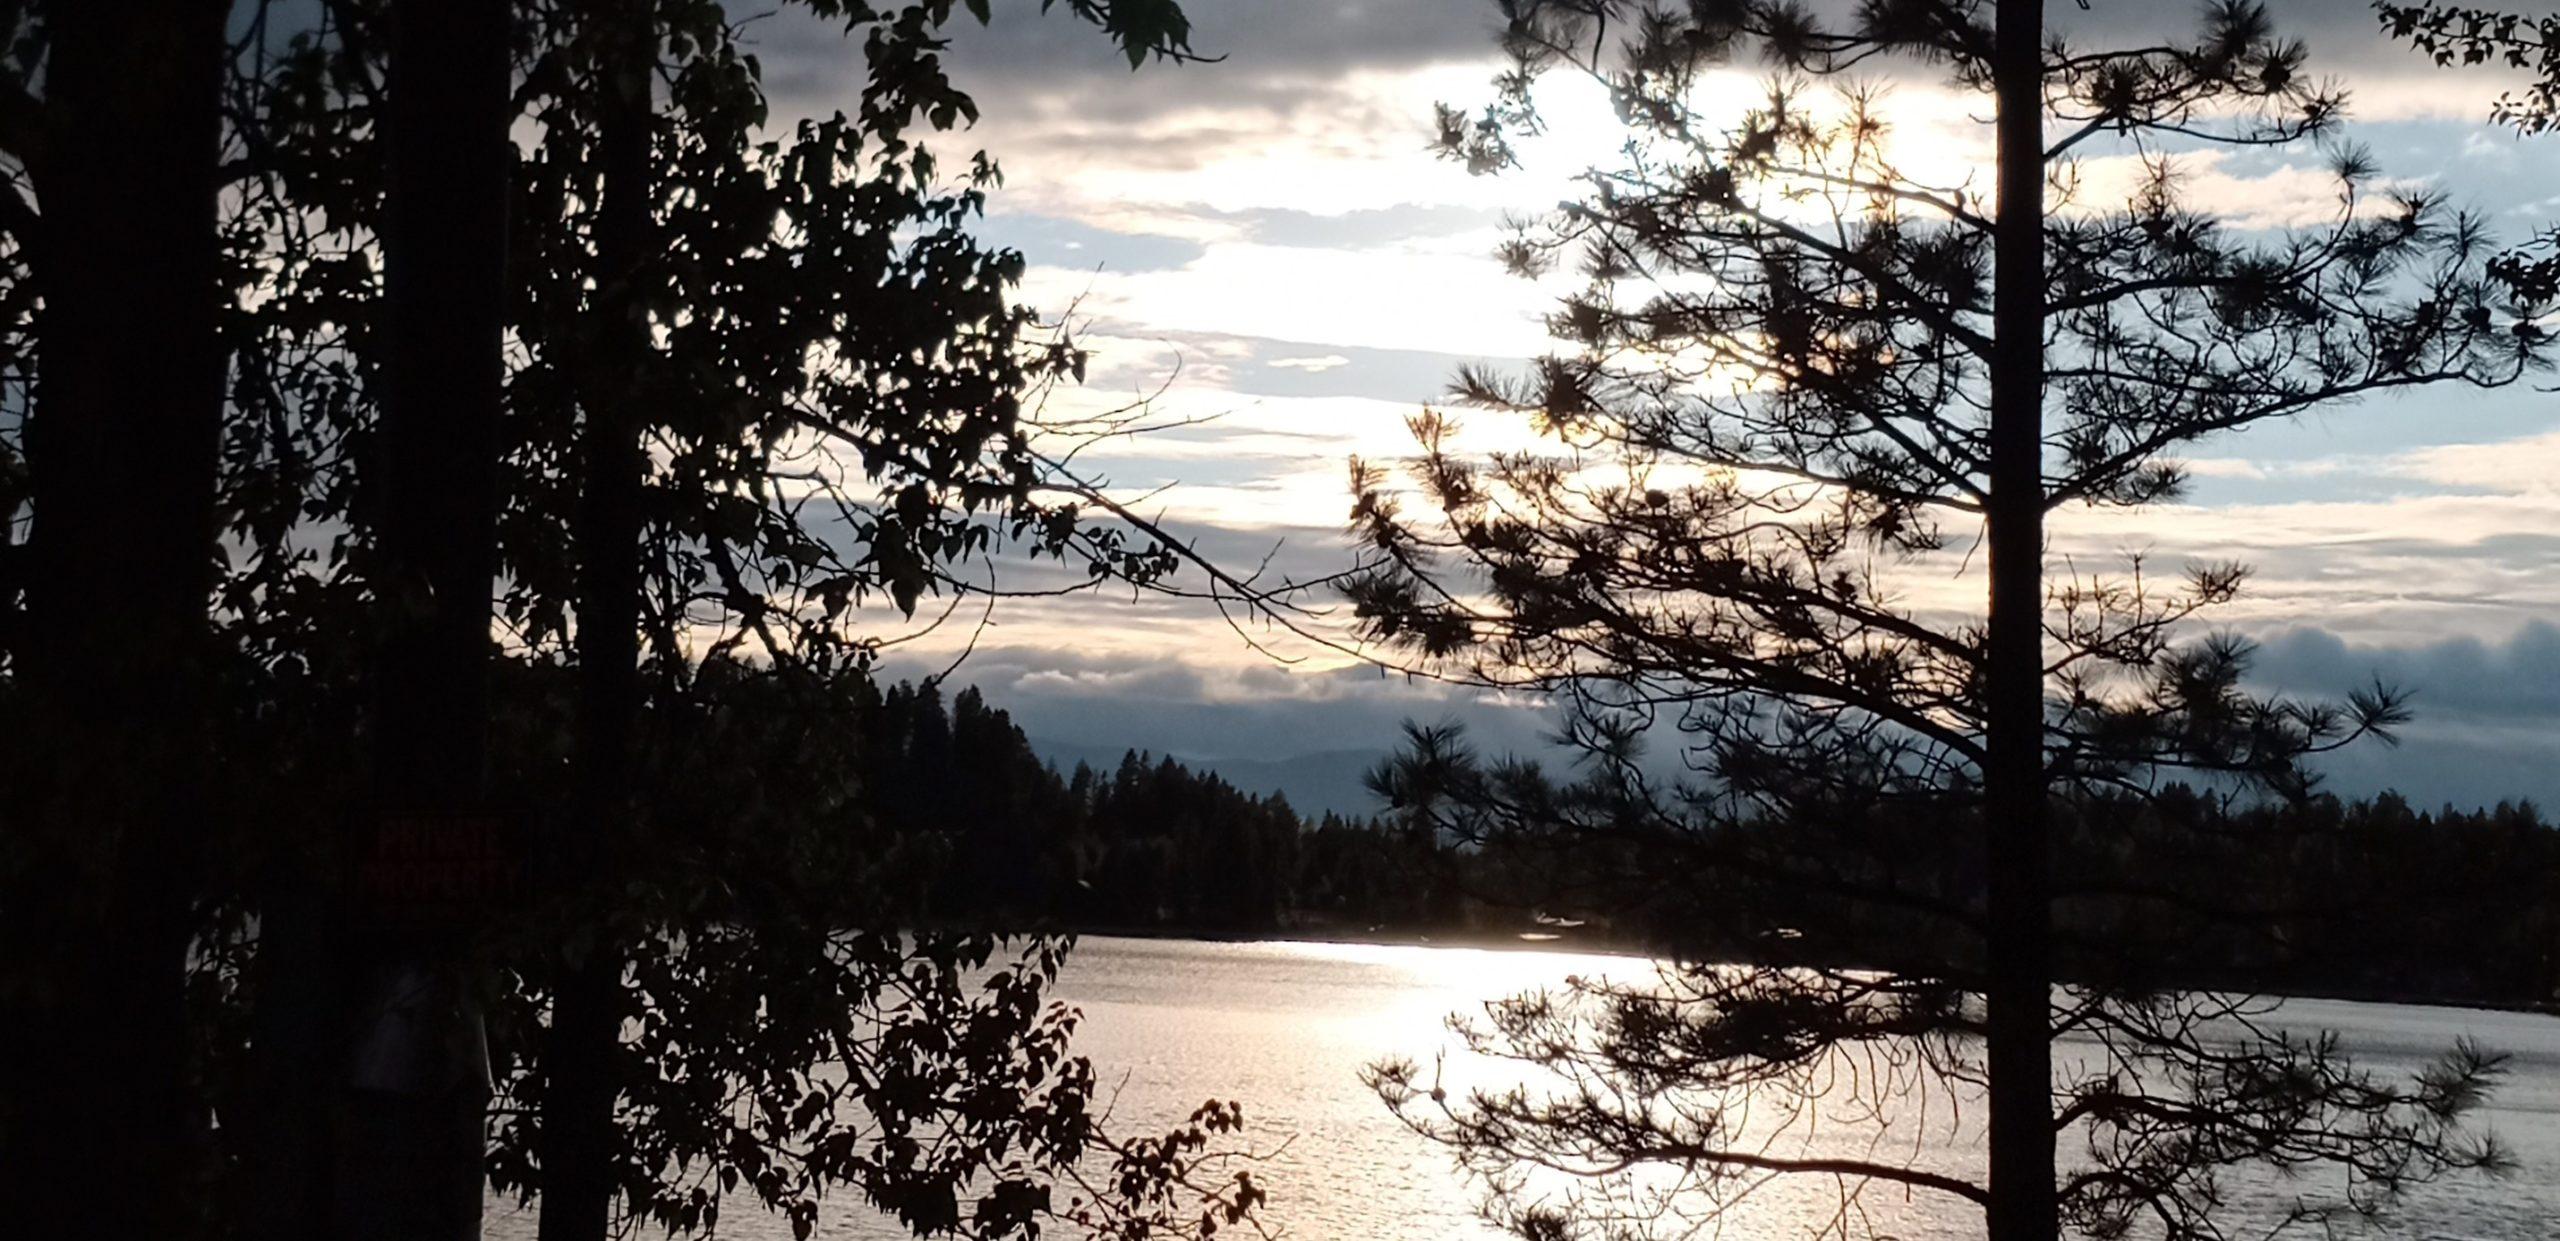 Feeling the Gratitude! Memorial Weekend at Bigfork Montana